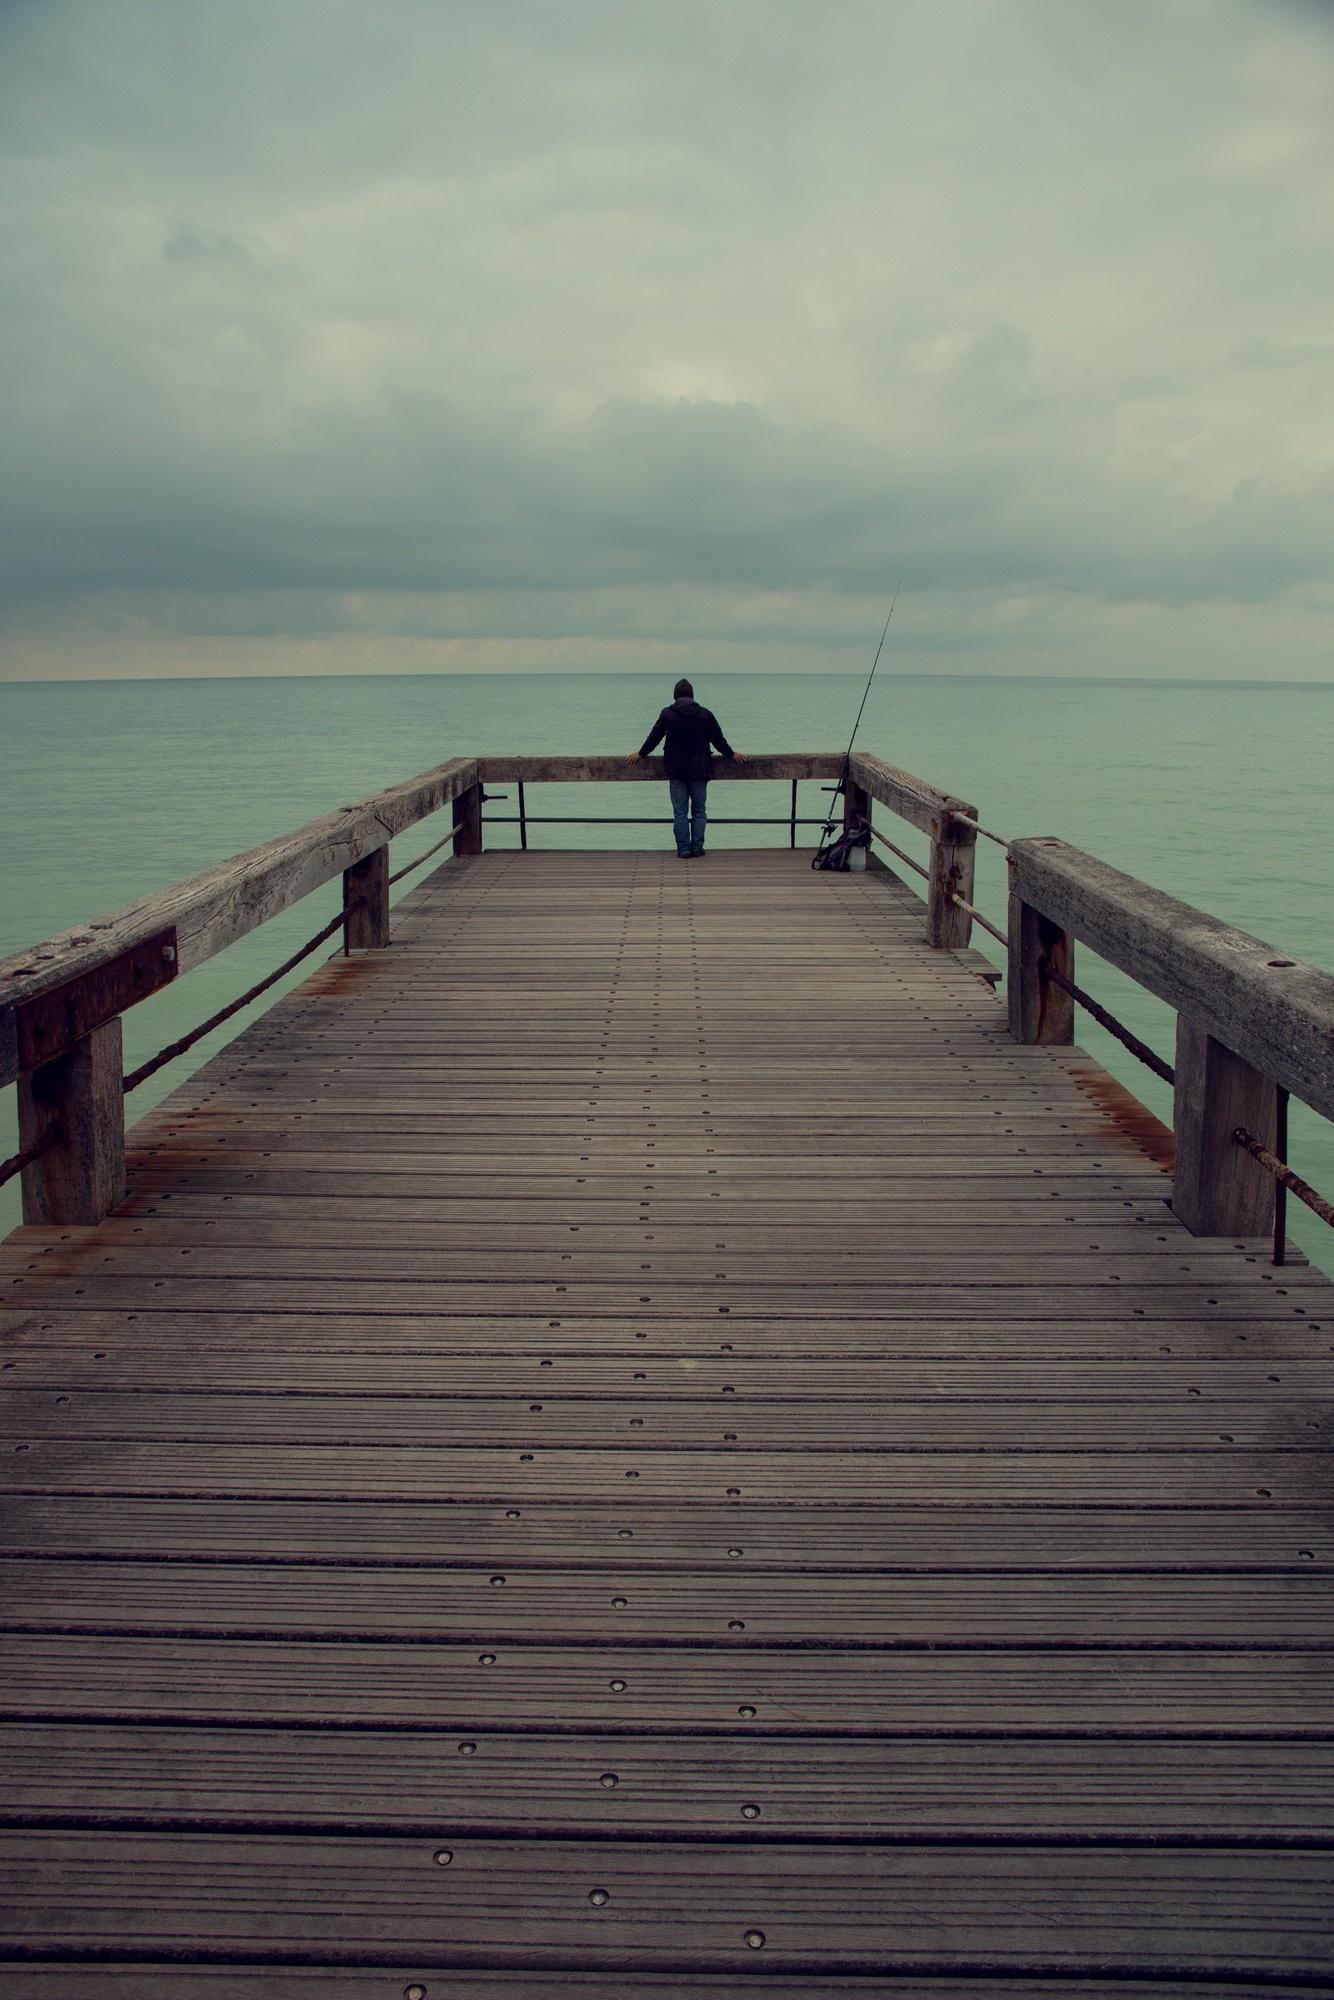 Asymmetrical loner Fisherman